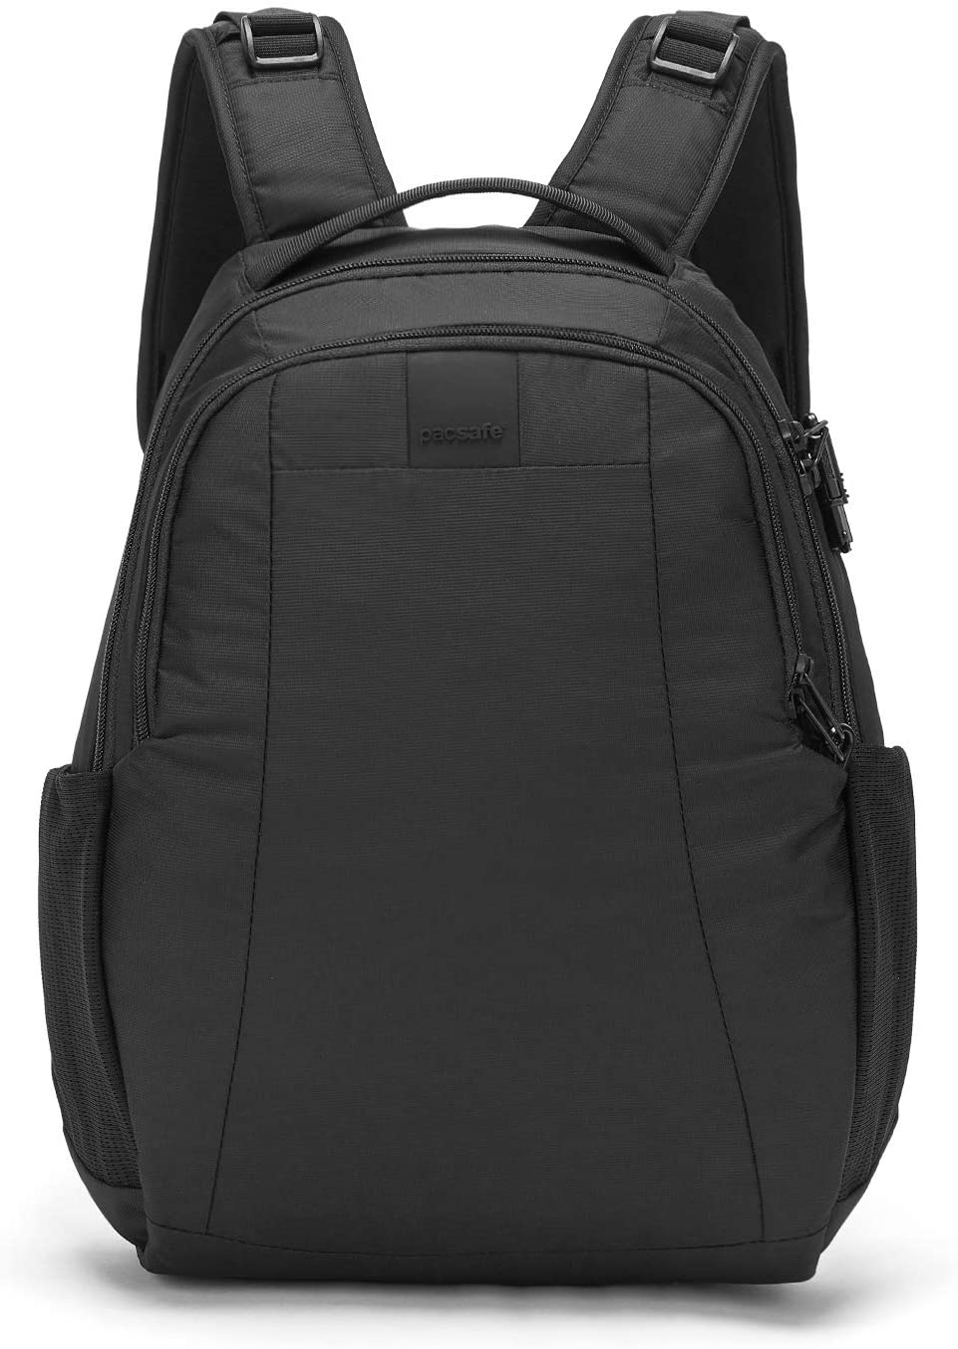 Pacsafe Metrosafe LS350 15 Liter Anti Theft Laptop Daypack/Backpack: Amazon.ca: Luggage & Bags